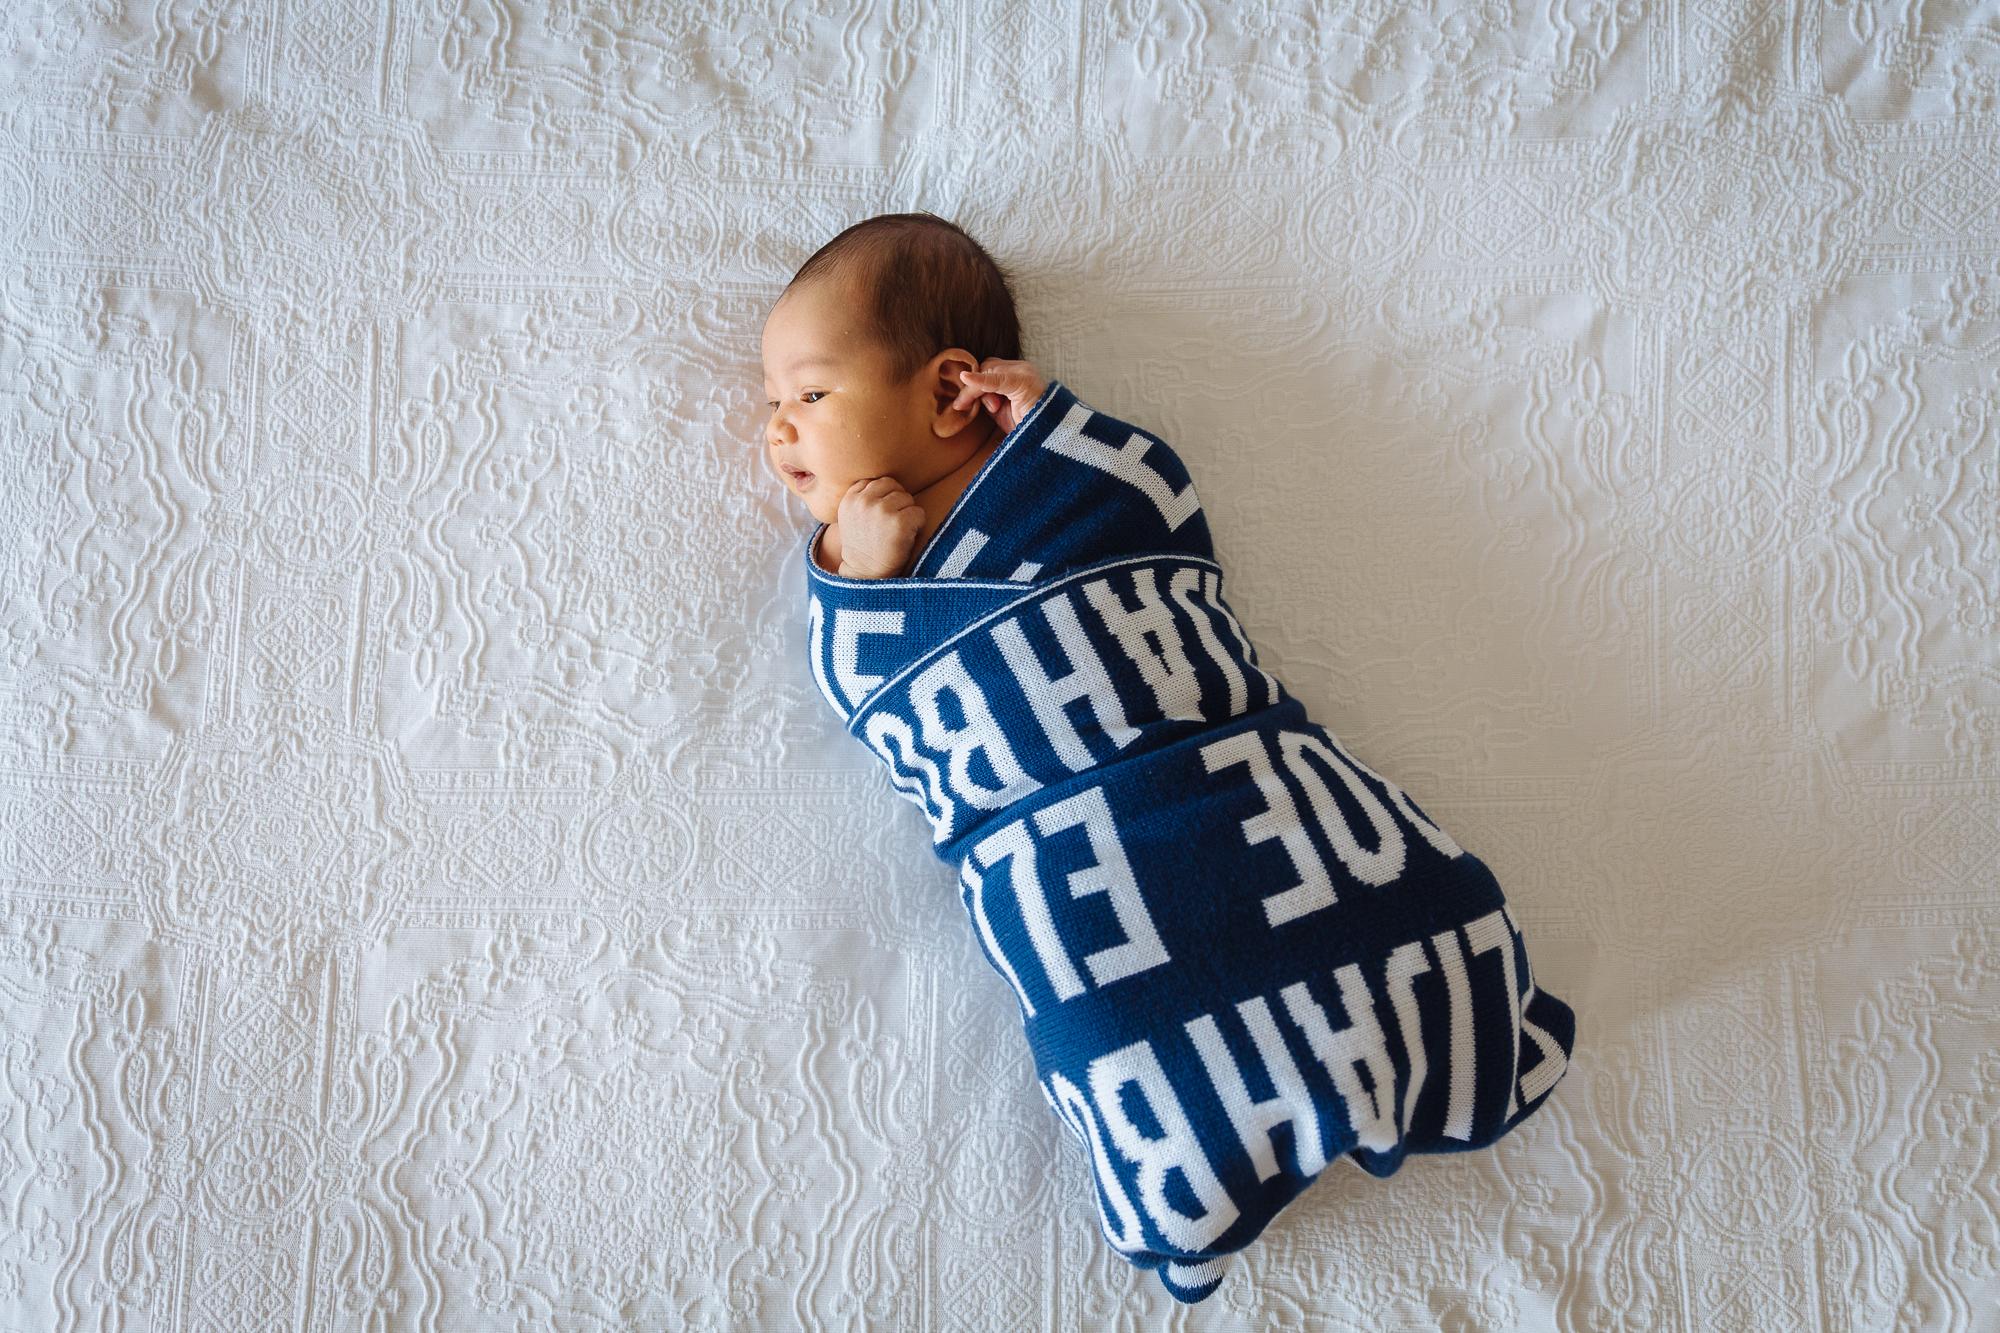 033_Newborn Lifetsyle_Elijah_Sunlight Photography.JPG